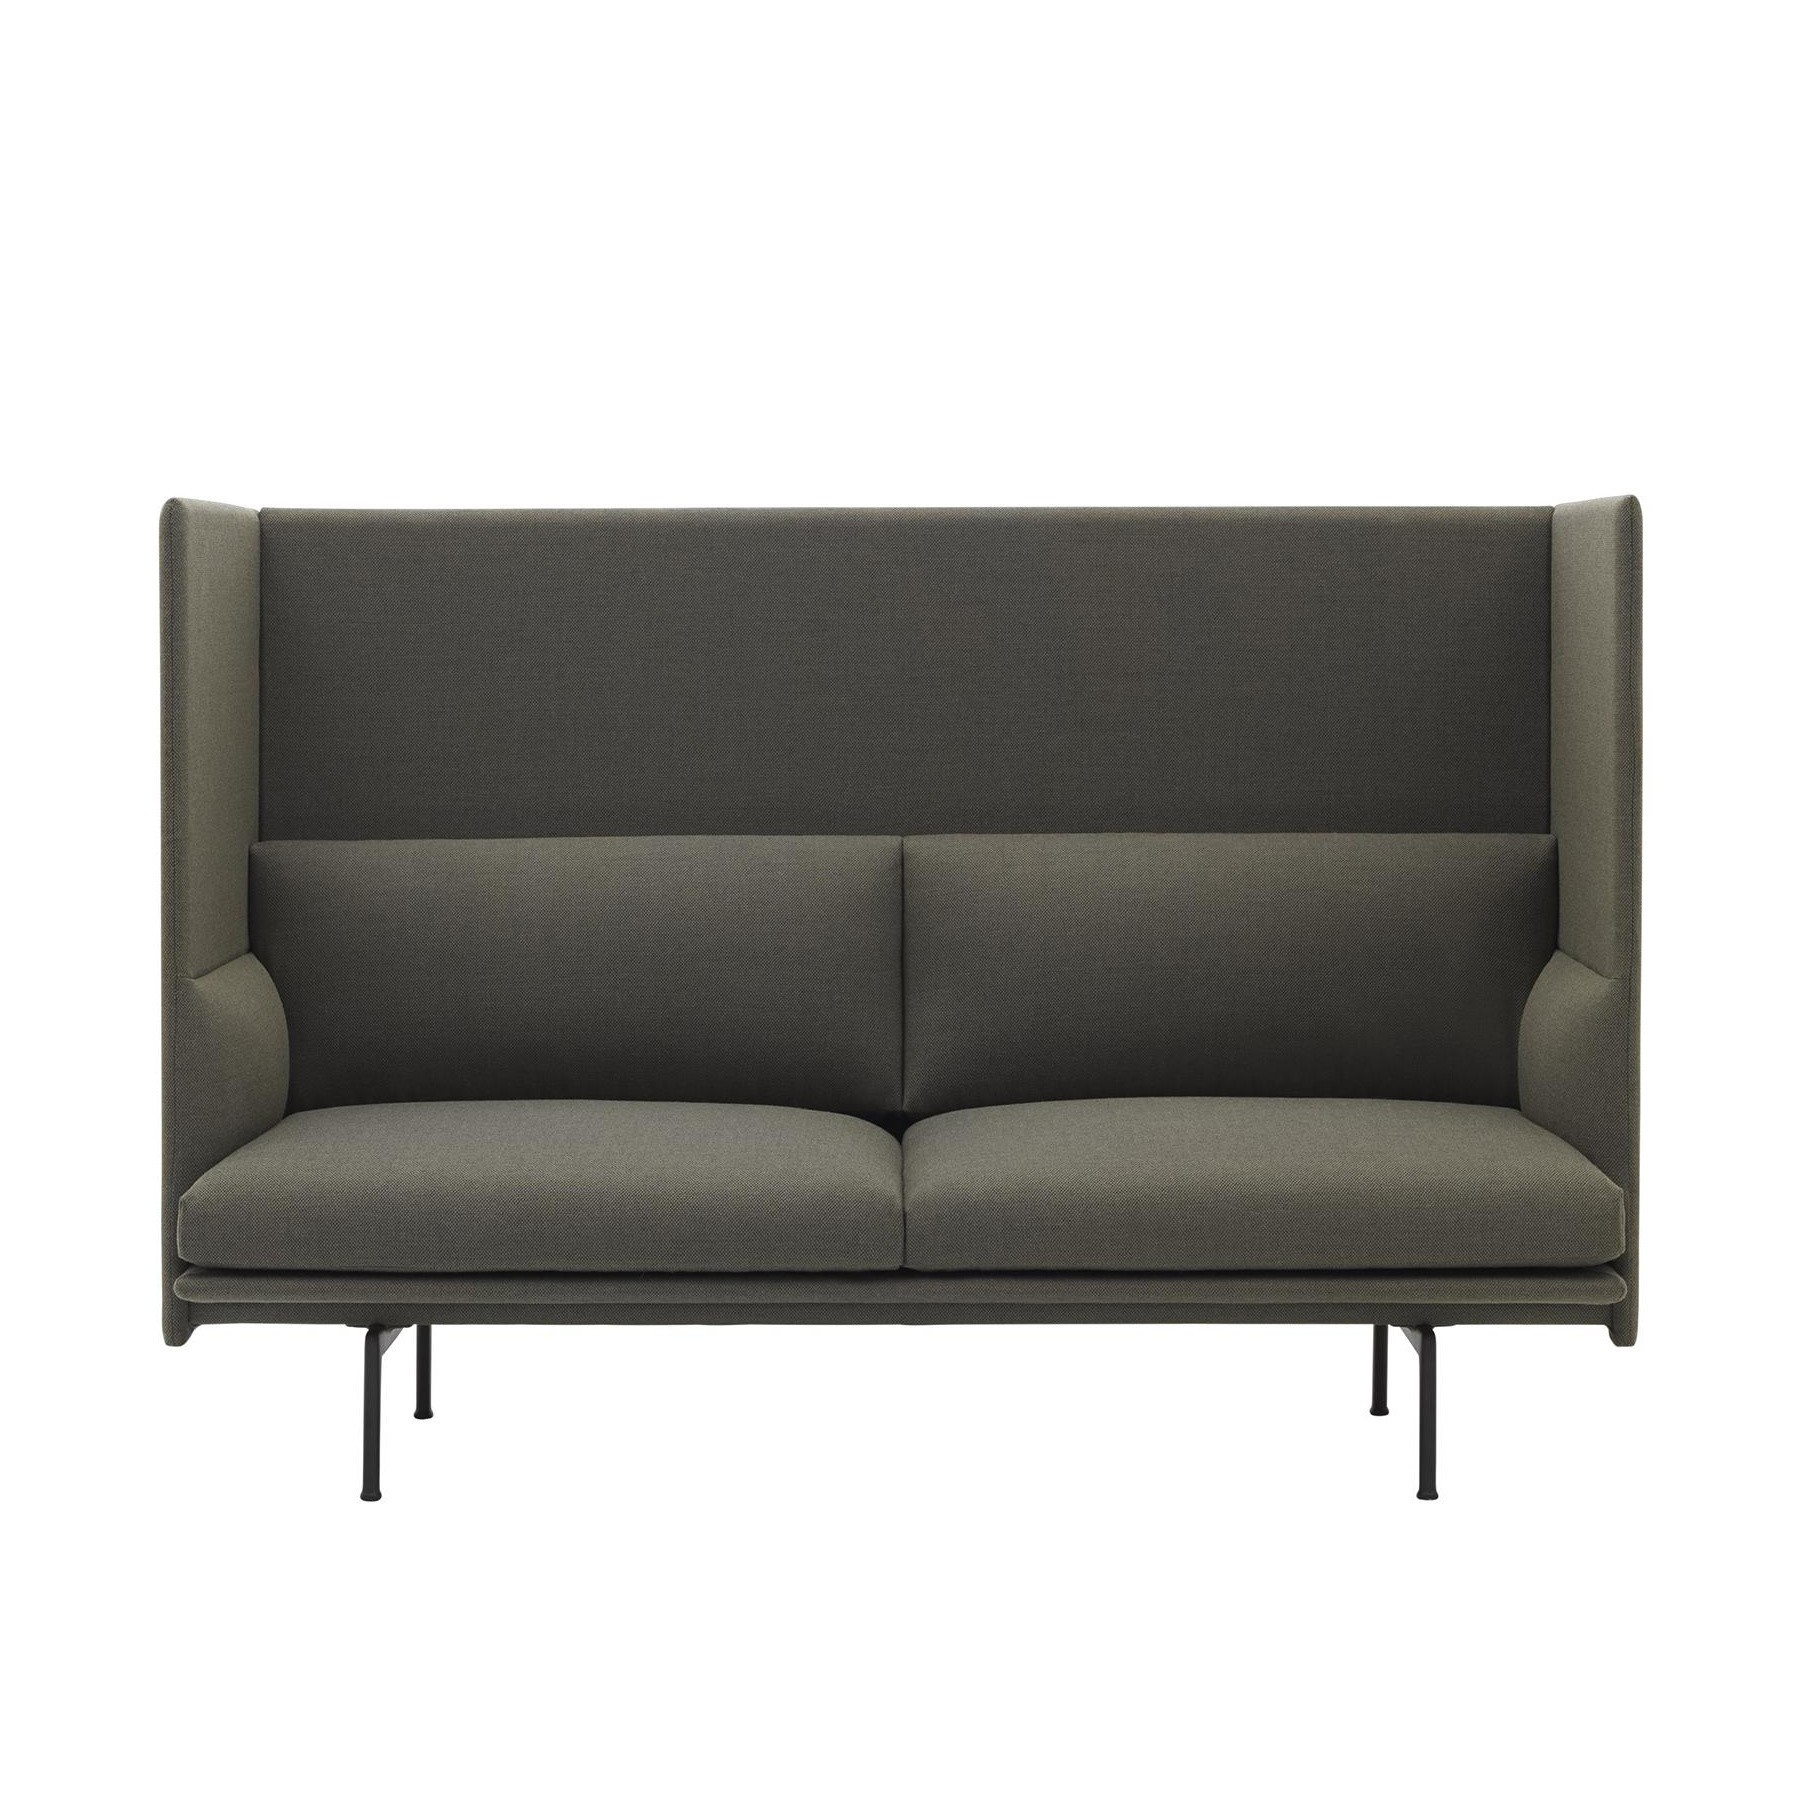 Muuto Outline Highback Sofa 2 Seater Ambientedirect